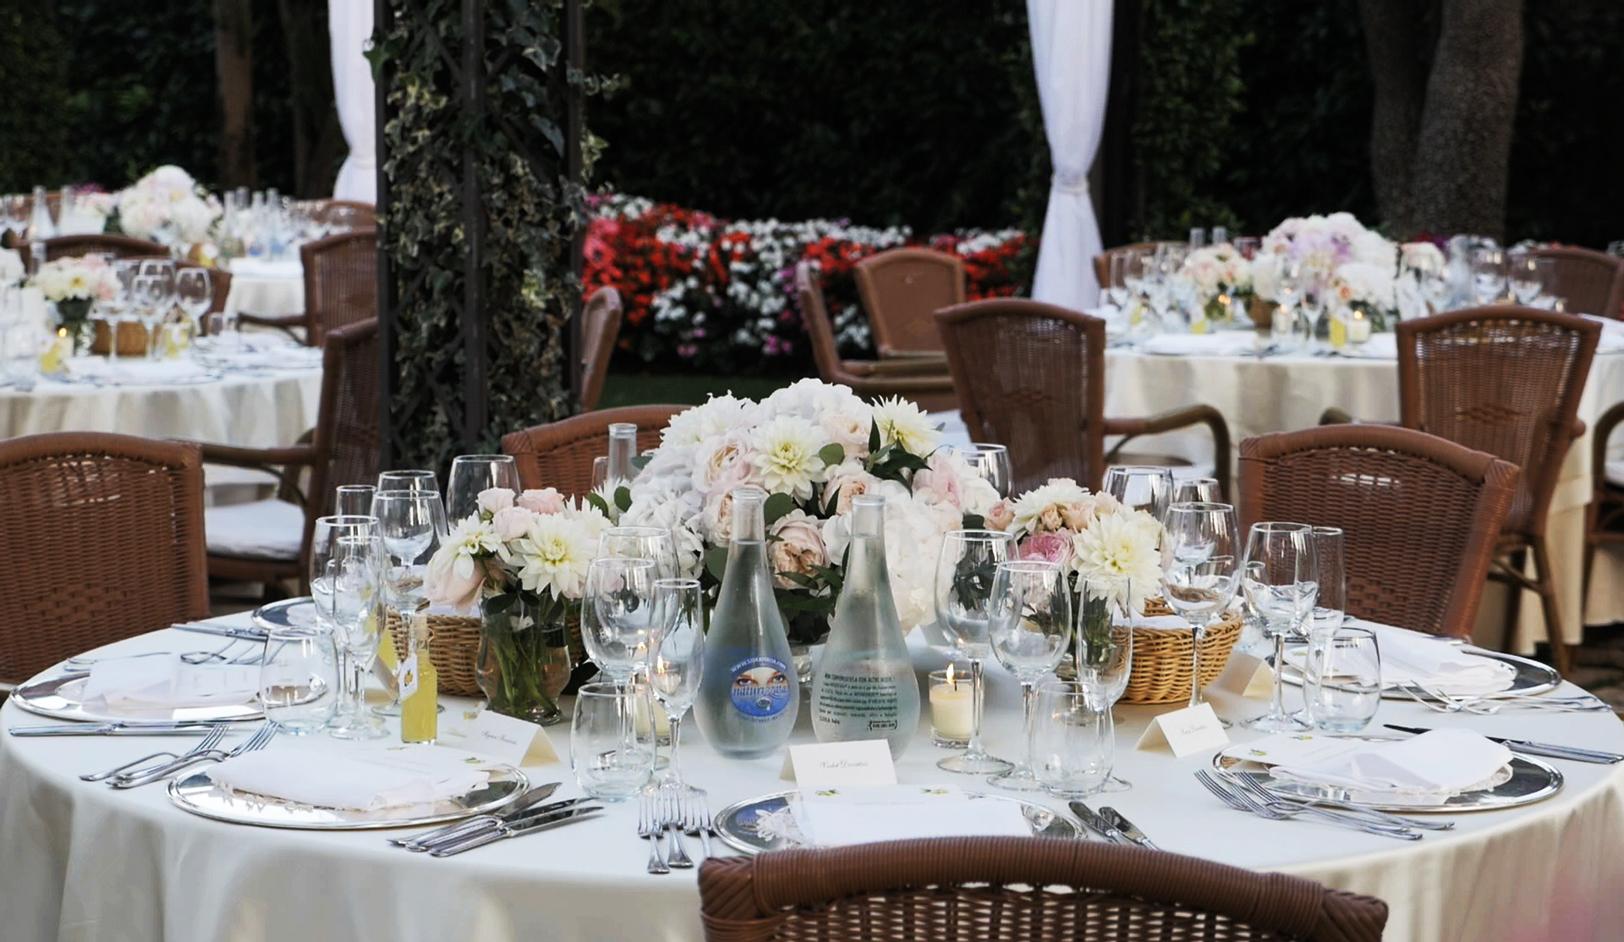 matrimonio-a-ravello-villa-cimbrone-villa-eva-costiera-amalfi-sorrento.jpg